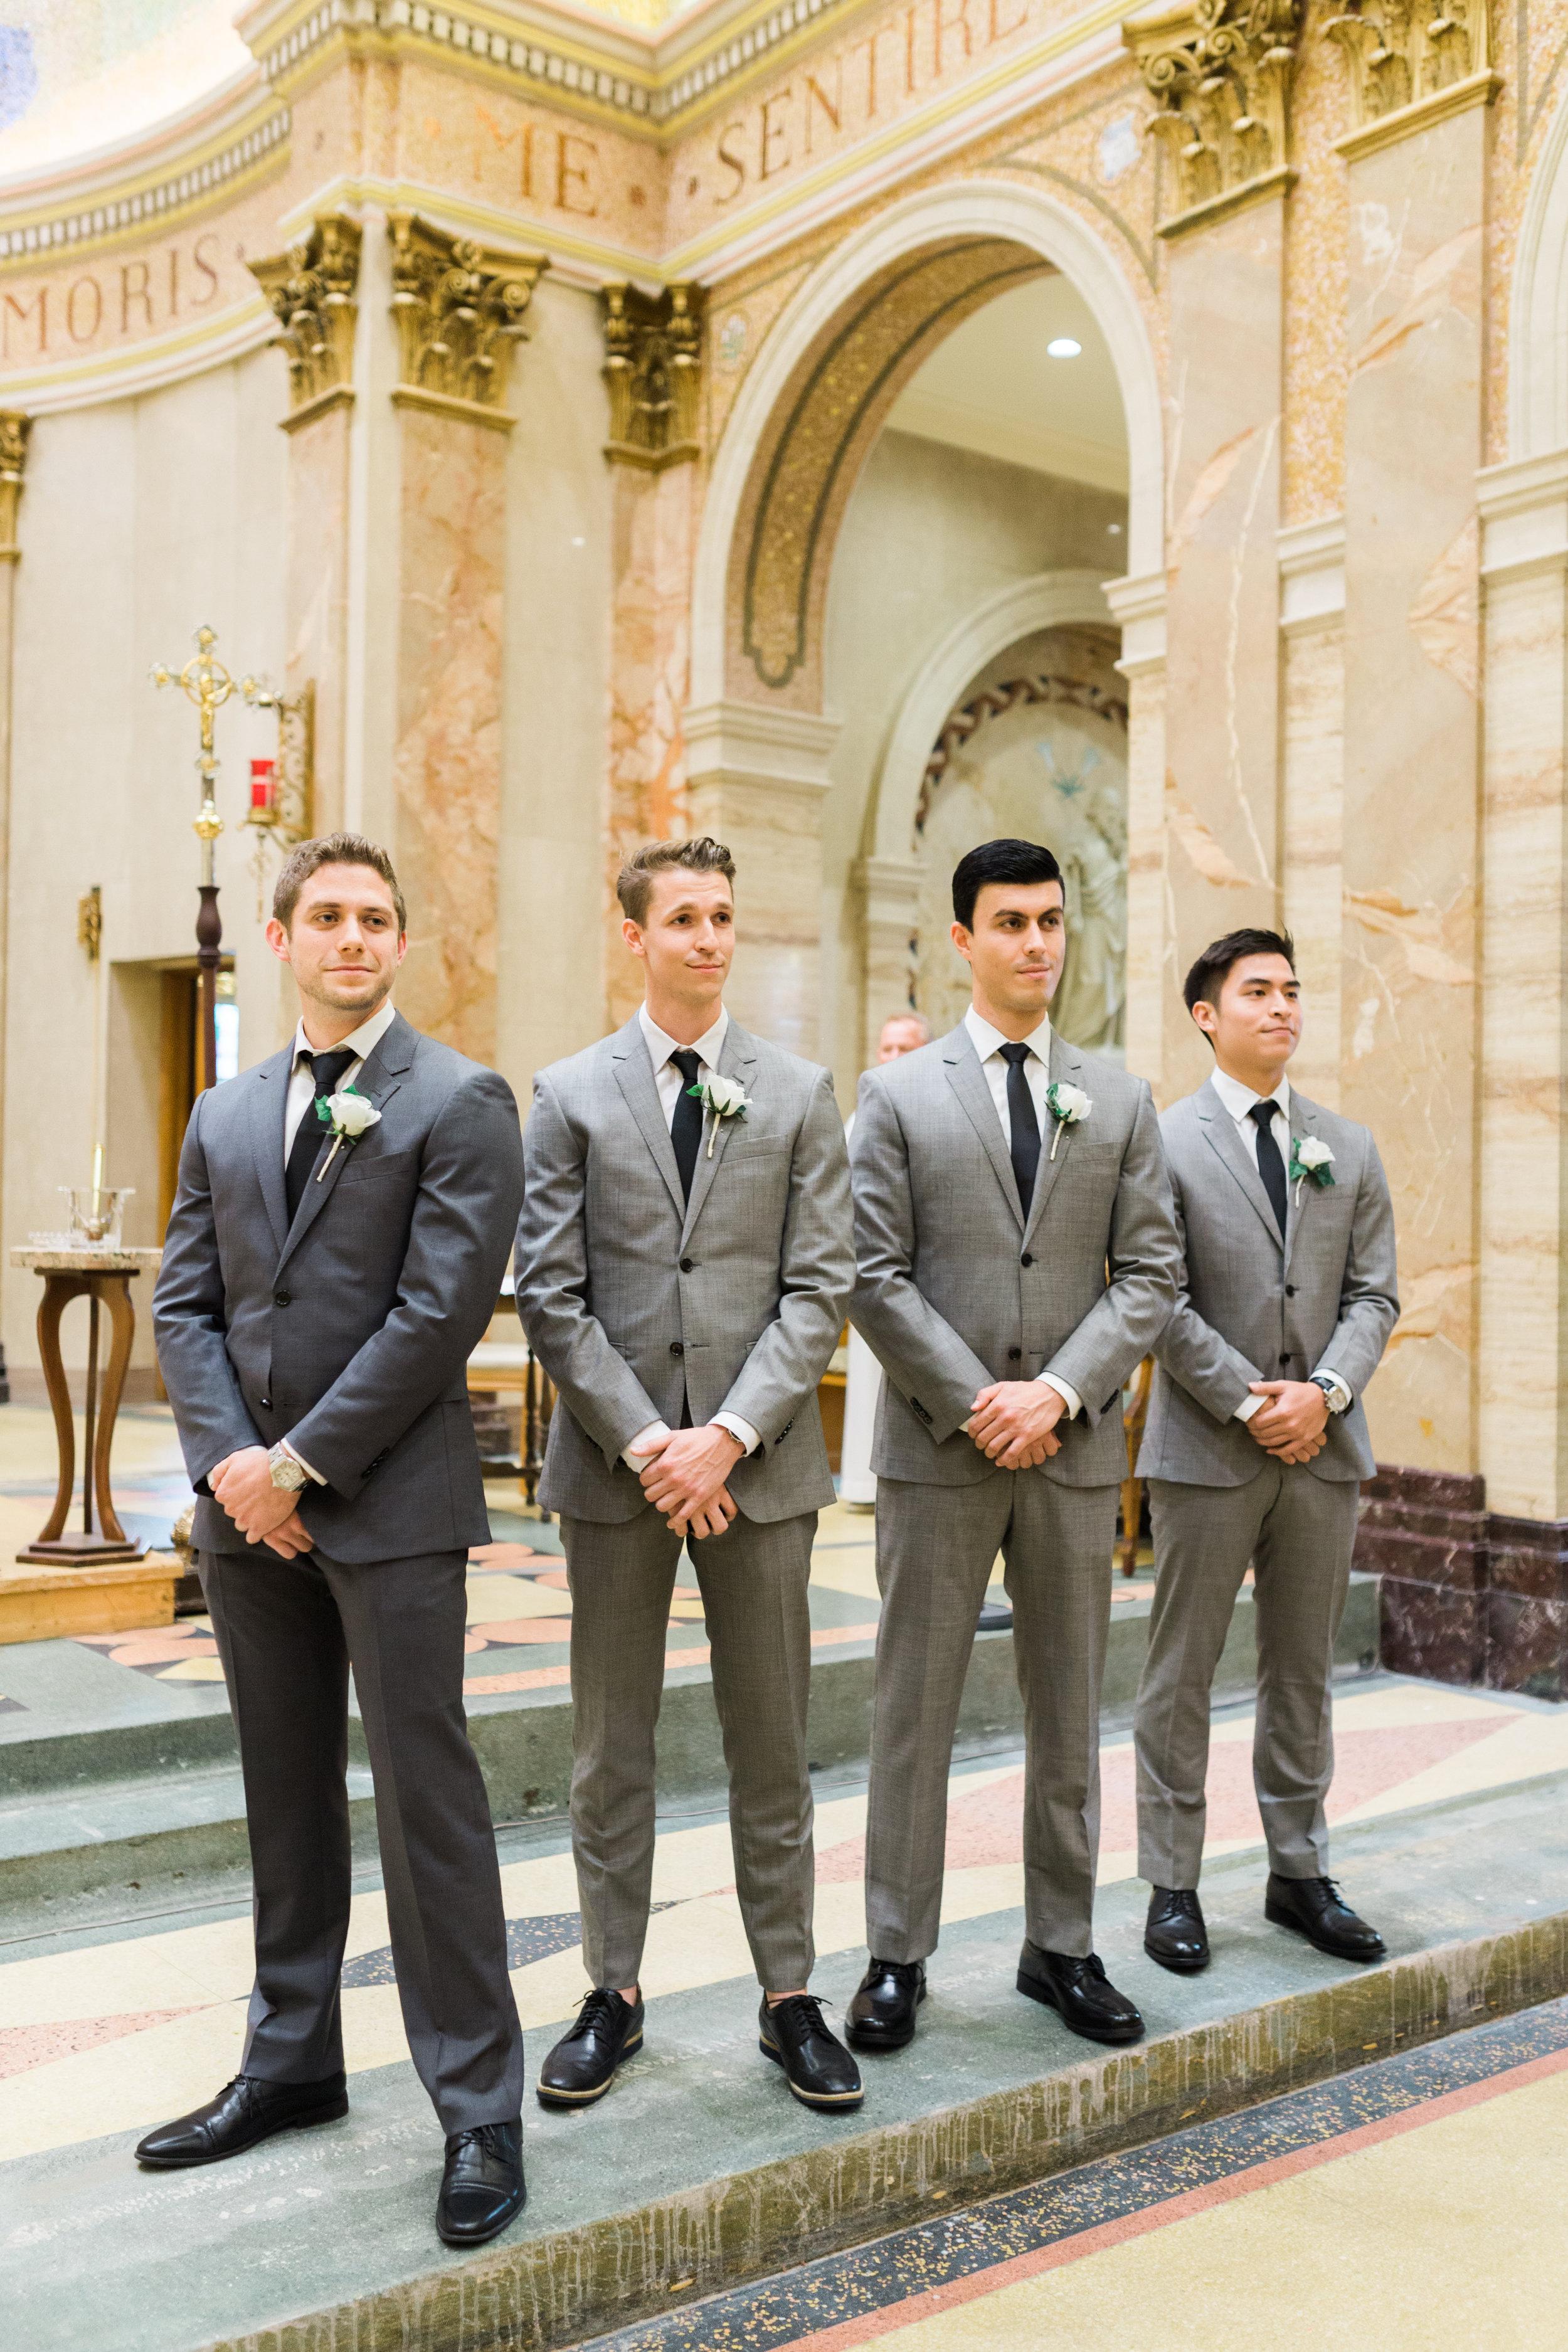 Toronto Fine Art Photographer - Lady of Sorrows Catholic Church Wedding - Ceremony-36.jpg